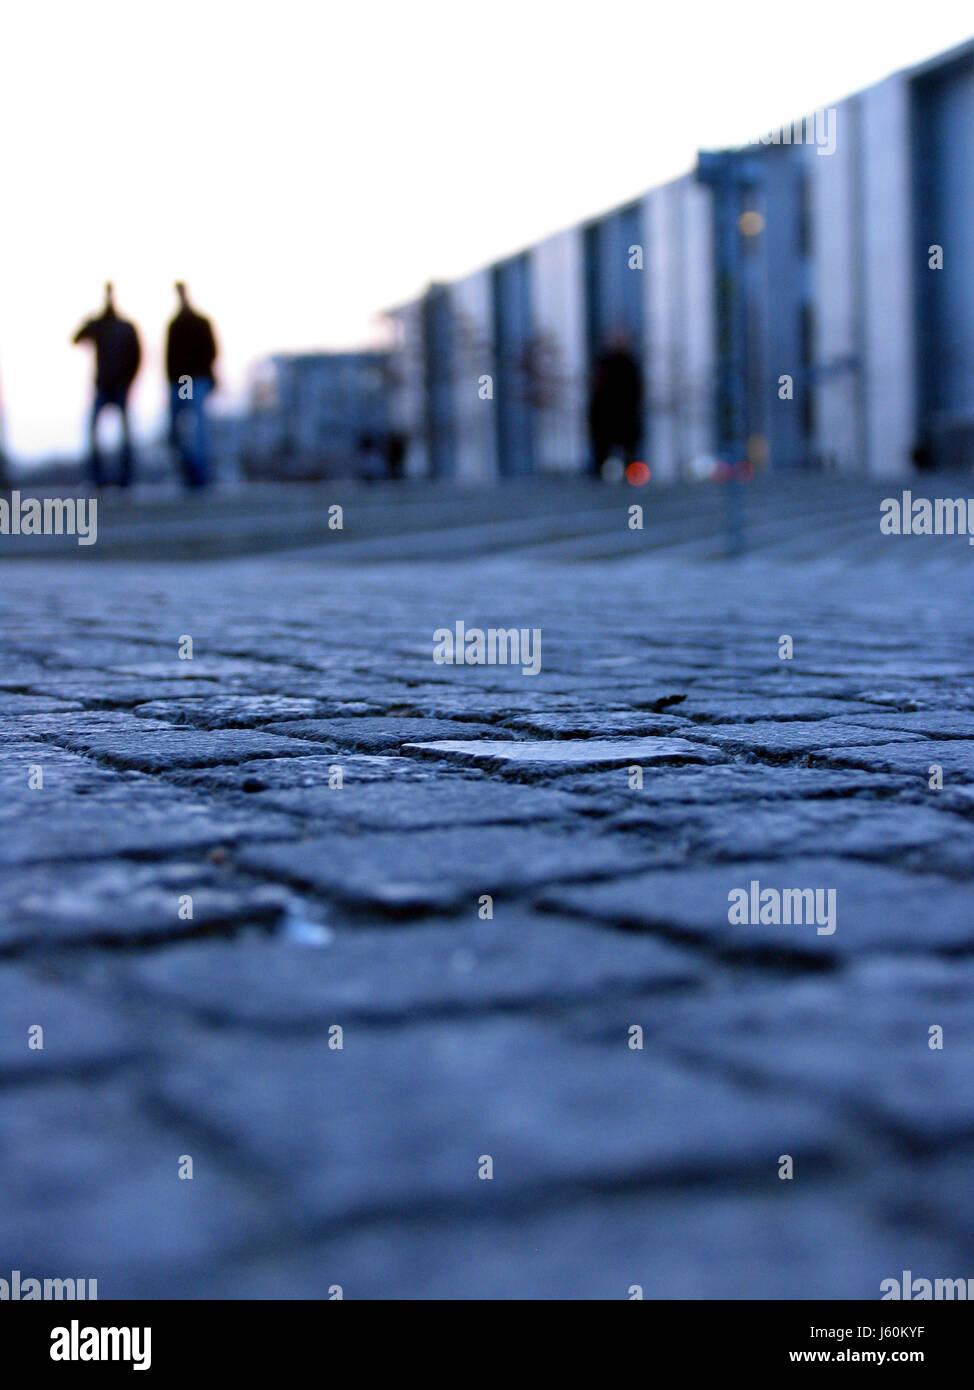 blue hour pedestrian cobblestone walk go for a walk street road blue city town - Stock Image